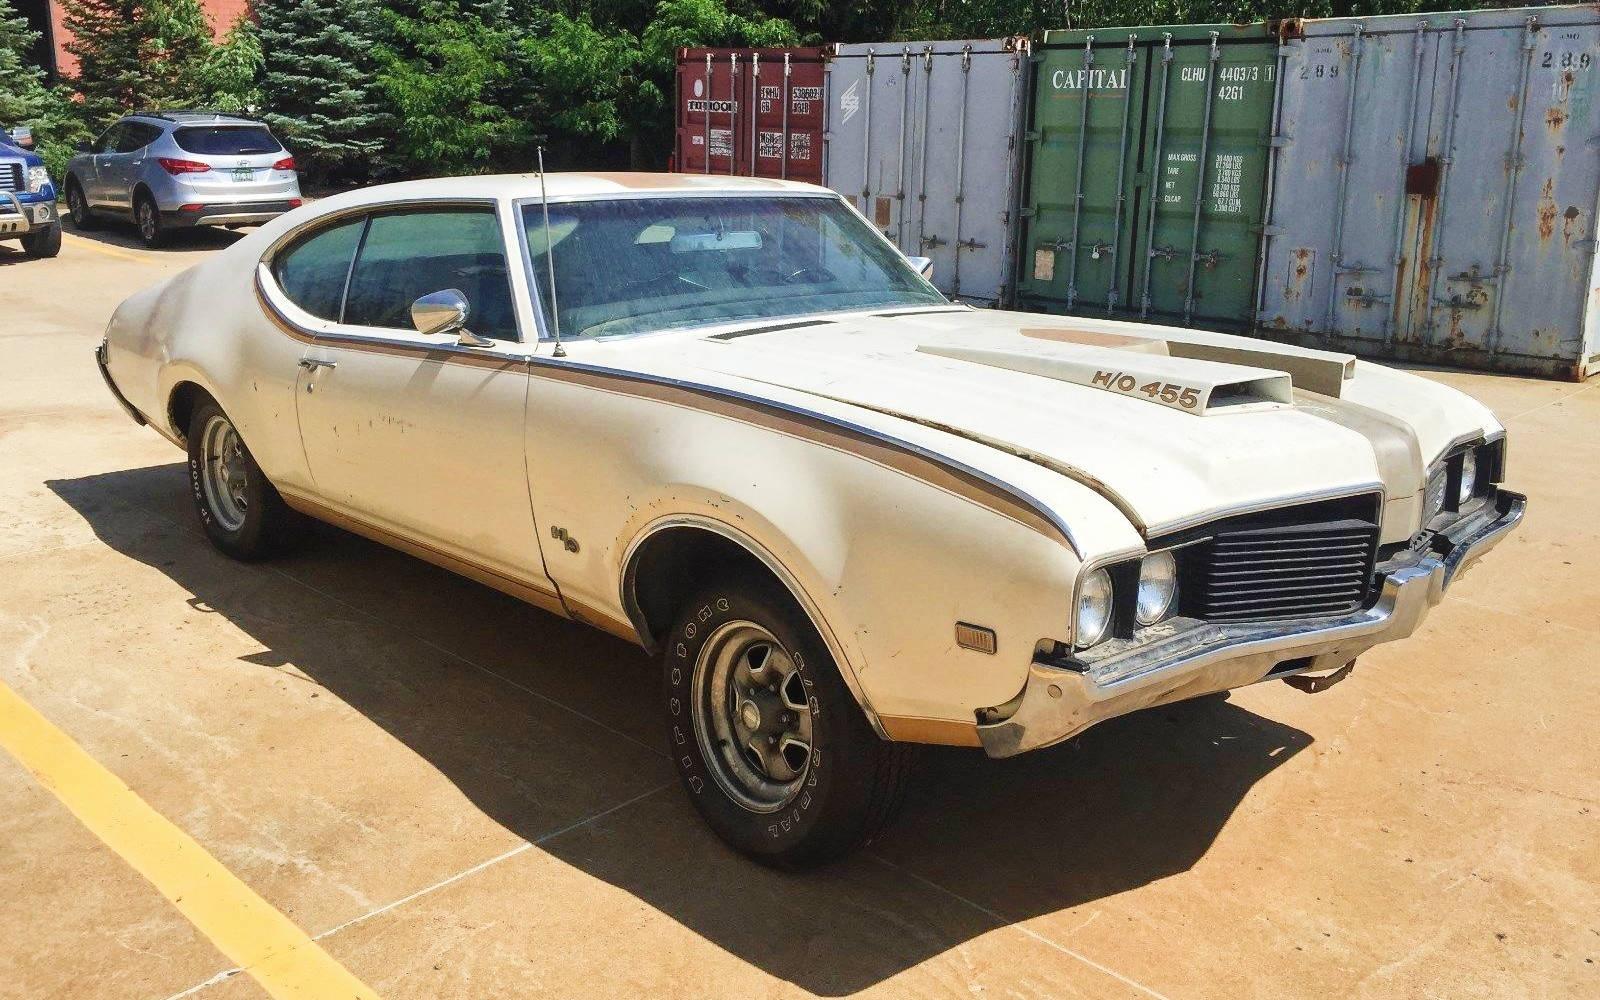 Number 403: 1969 Hurst Oldsmobile 442